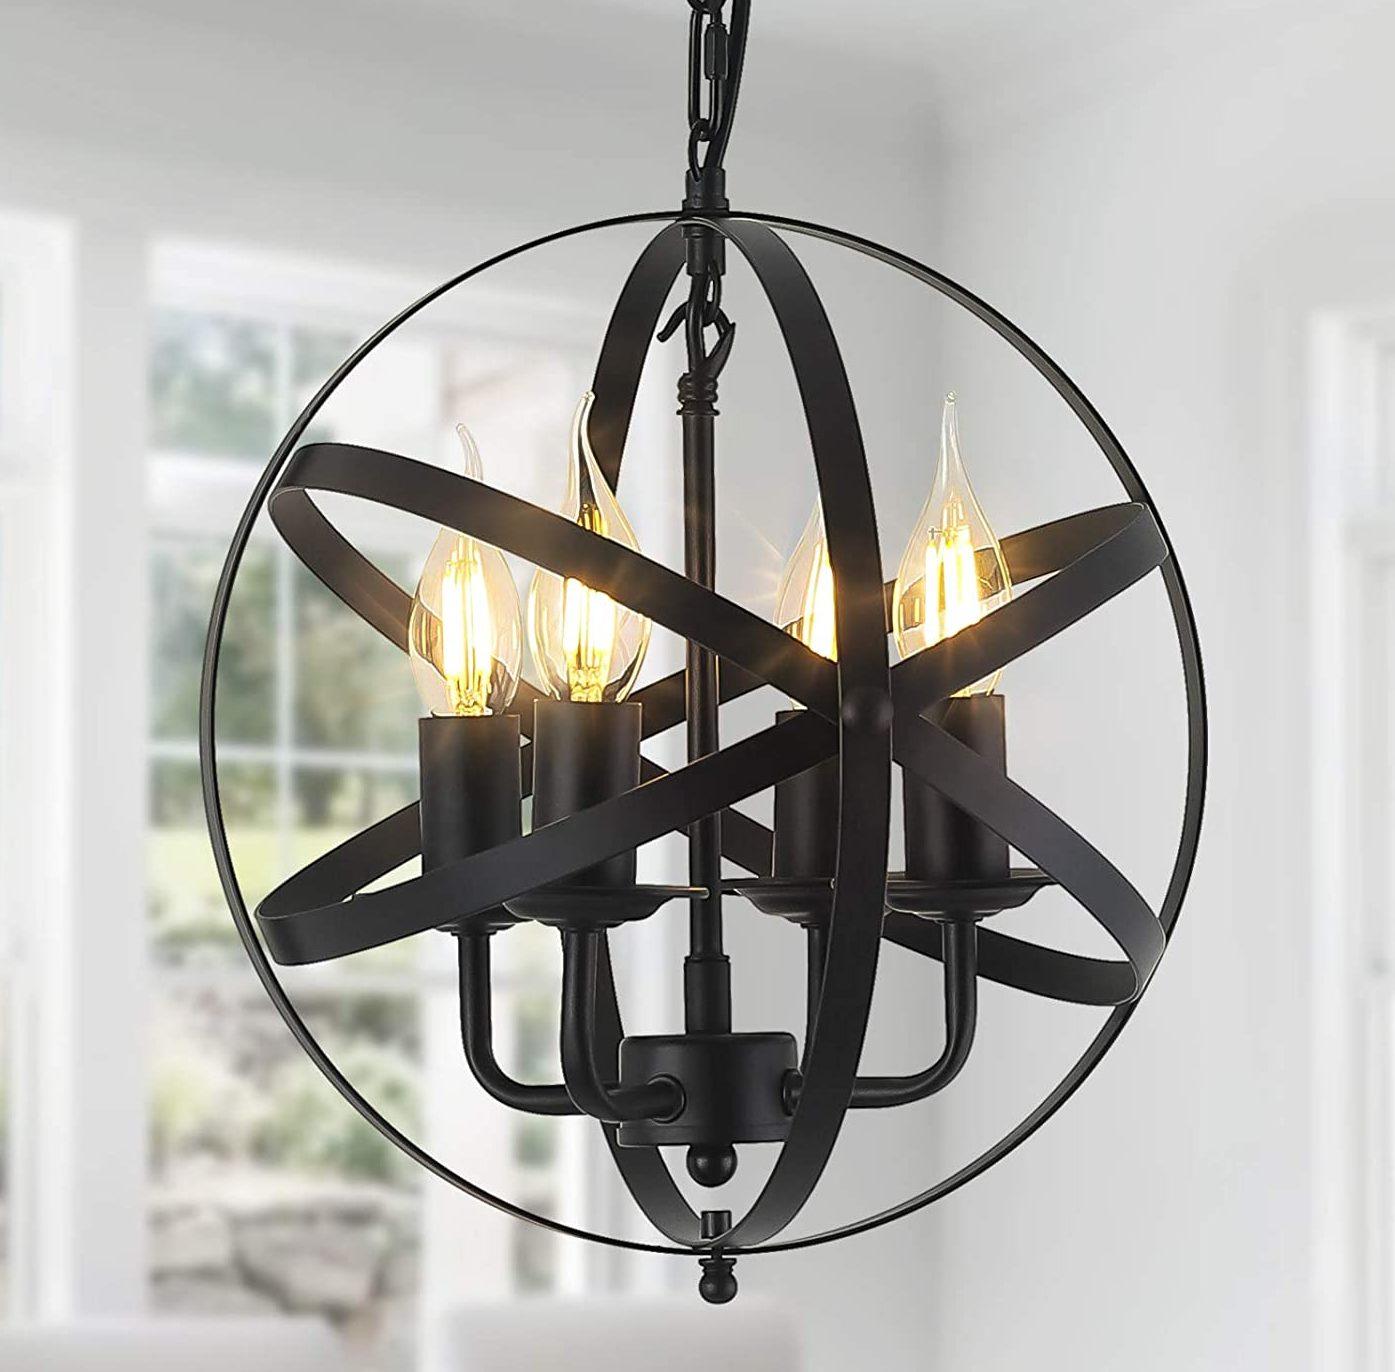 4-Light Hanging Spherical Rustic Pendant Light